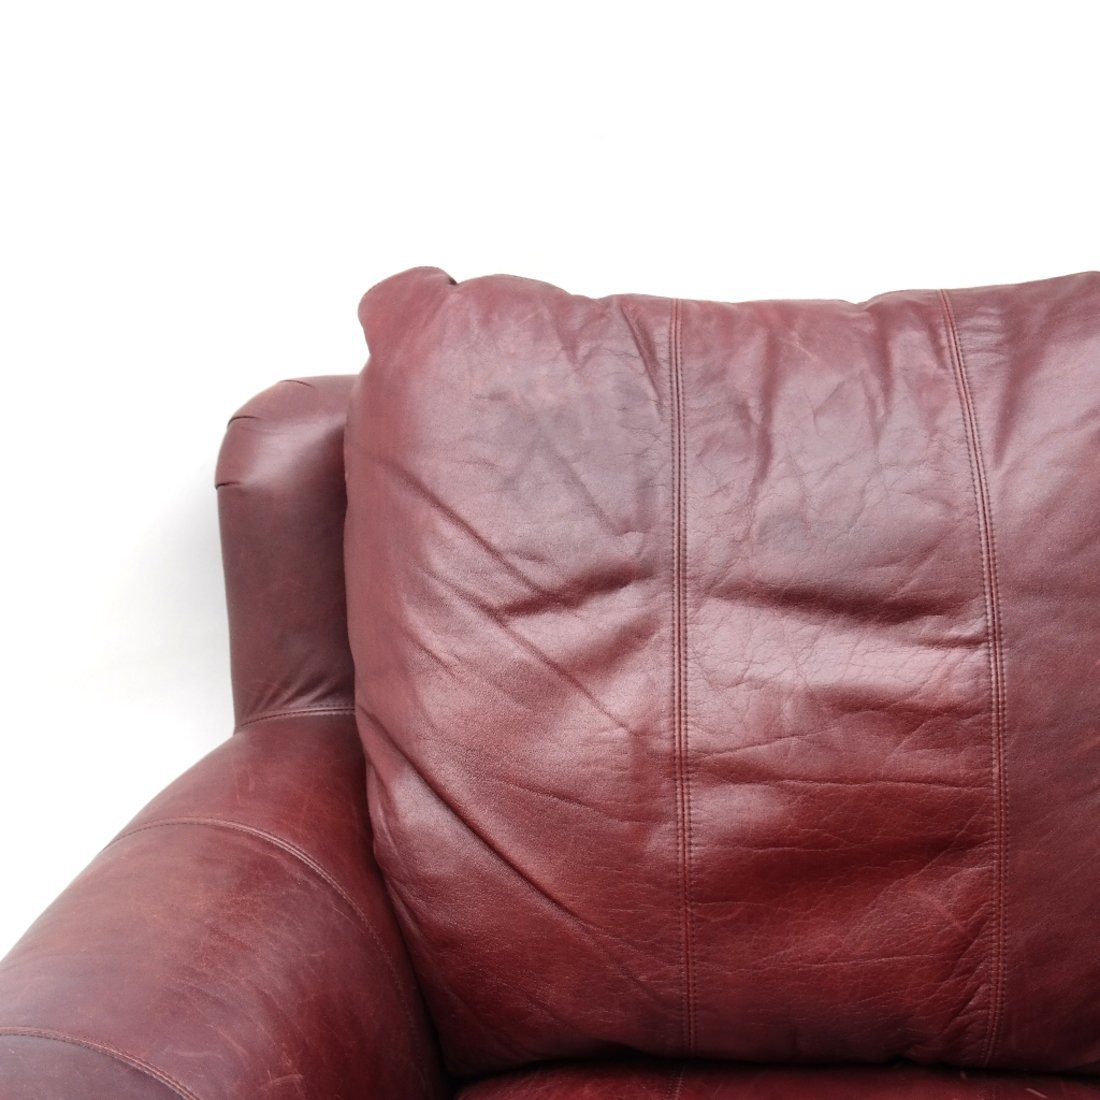 Burgundy Club Chair & Ottoman - 4